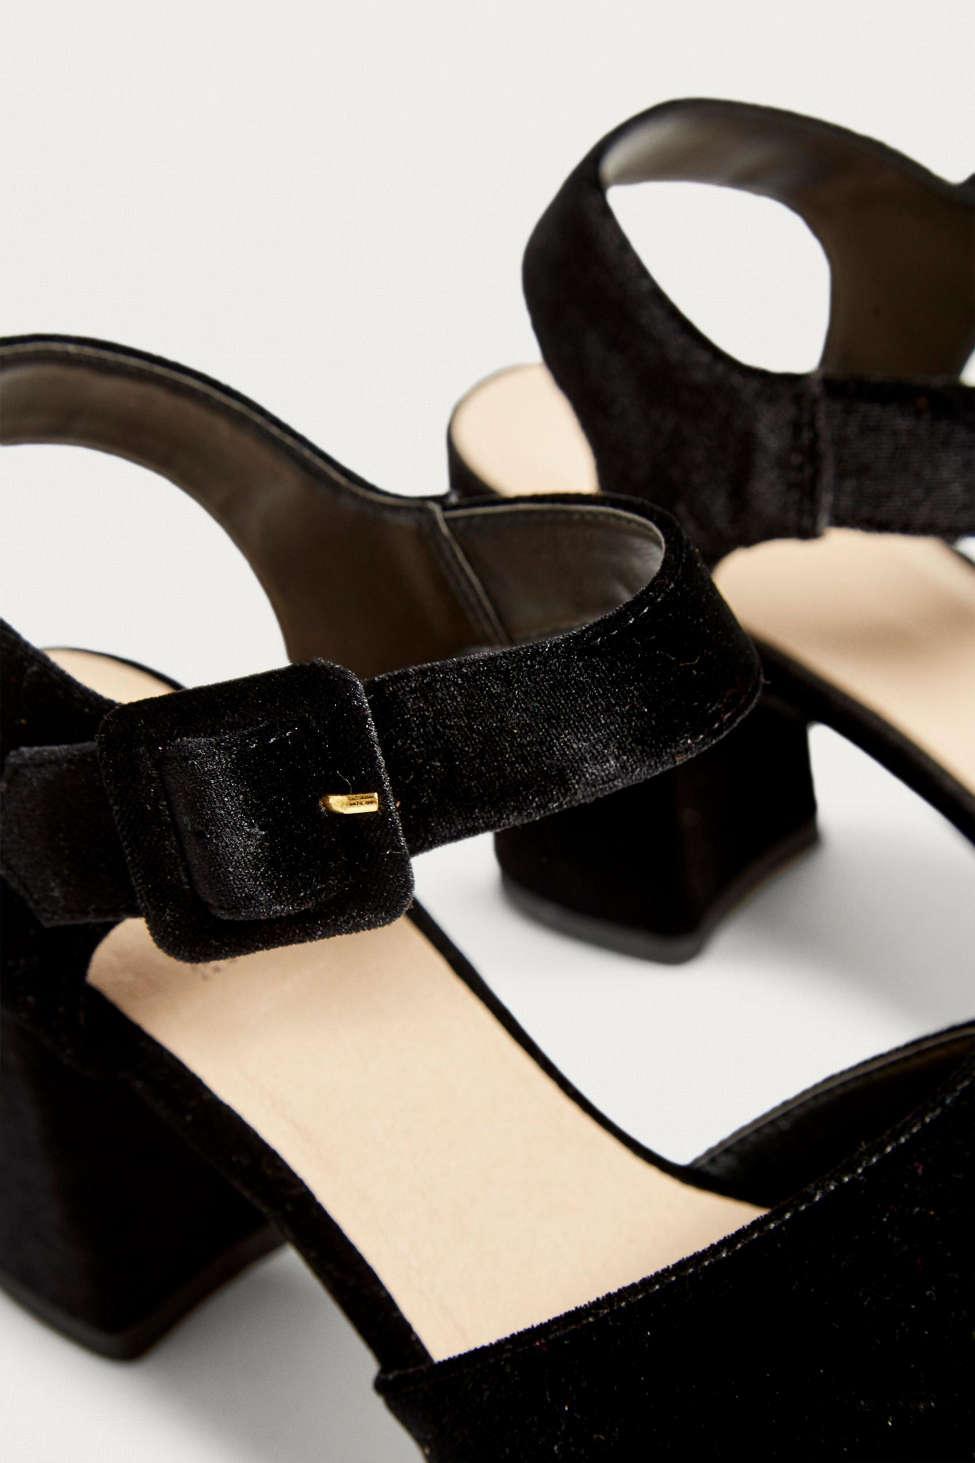 6b72fc7c0e Lyst - Urban Outfitters Uo Harlem Platform Heel in Black